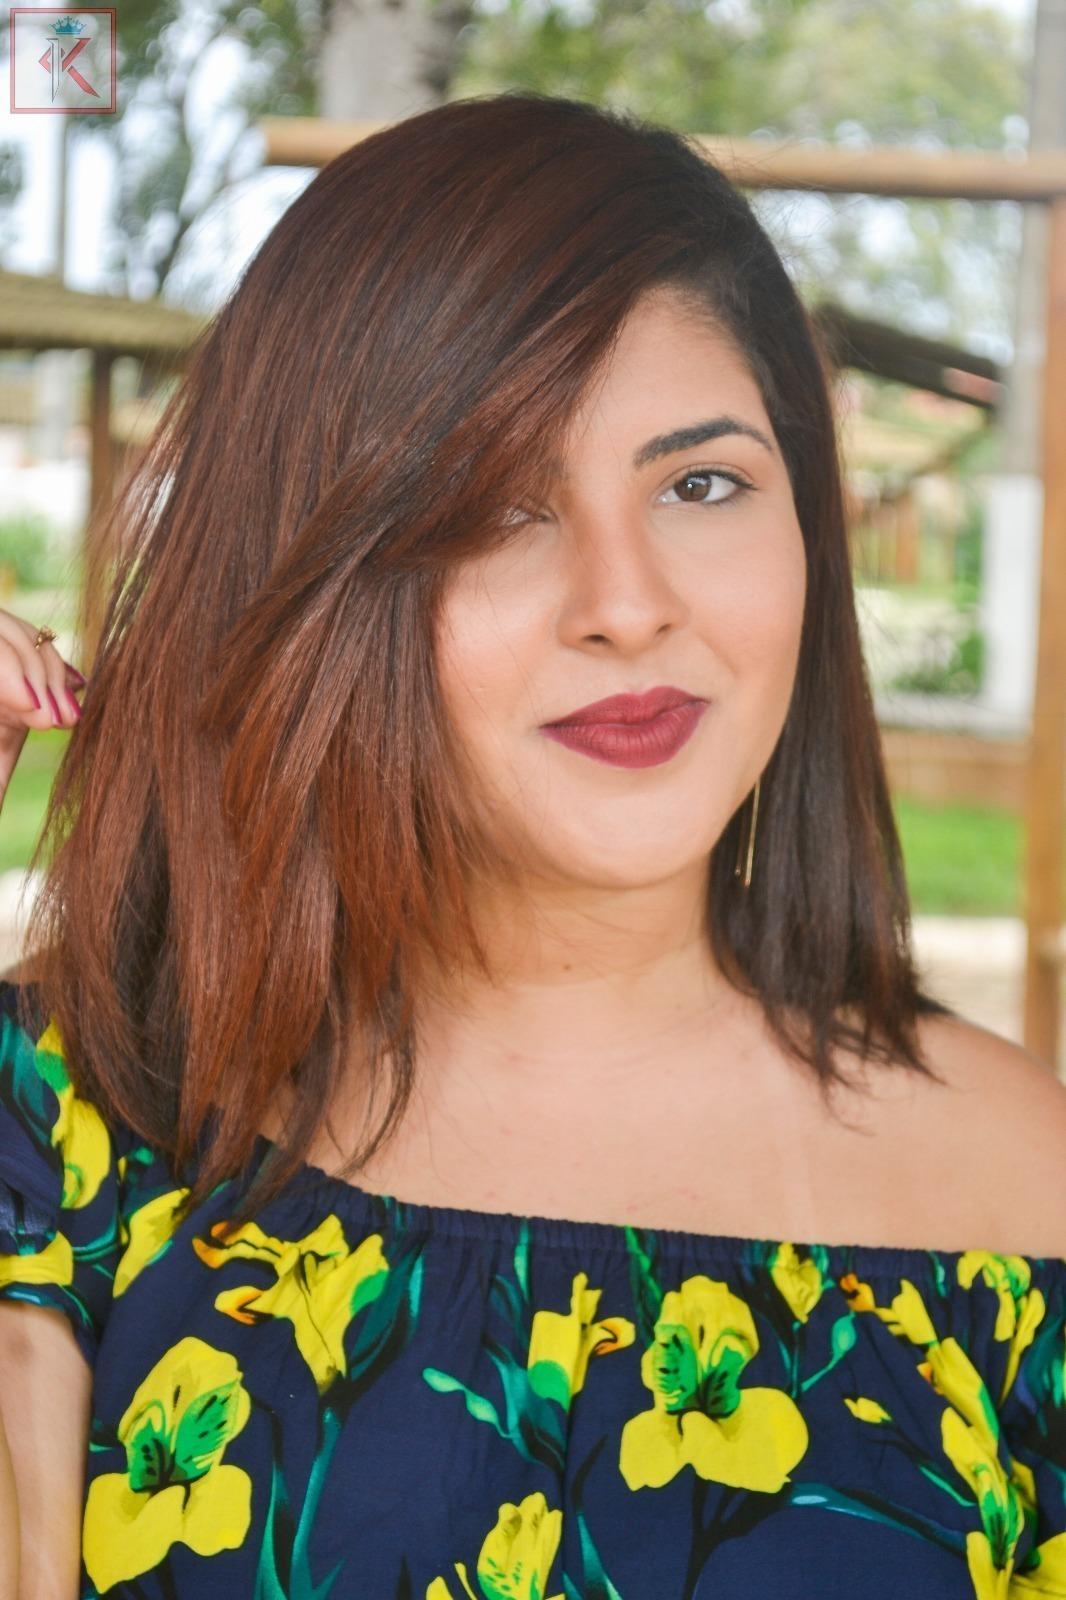 Makeup clean kiss maquiagem micropigmentador(a) maquiador(a) cosmetólogo(a) depilador(a) designer de sobrancelhas esteticista estudante massagista massoterapeuta assistente esteticista